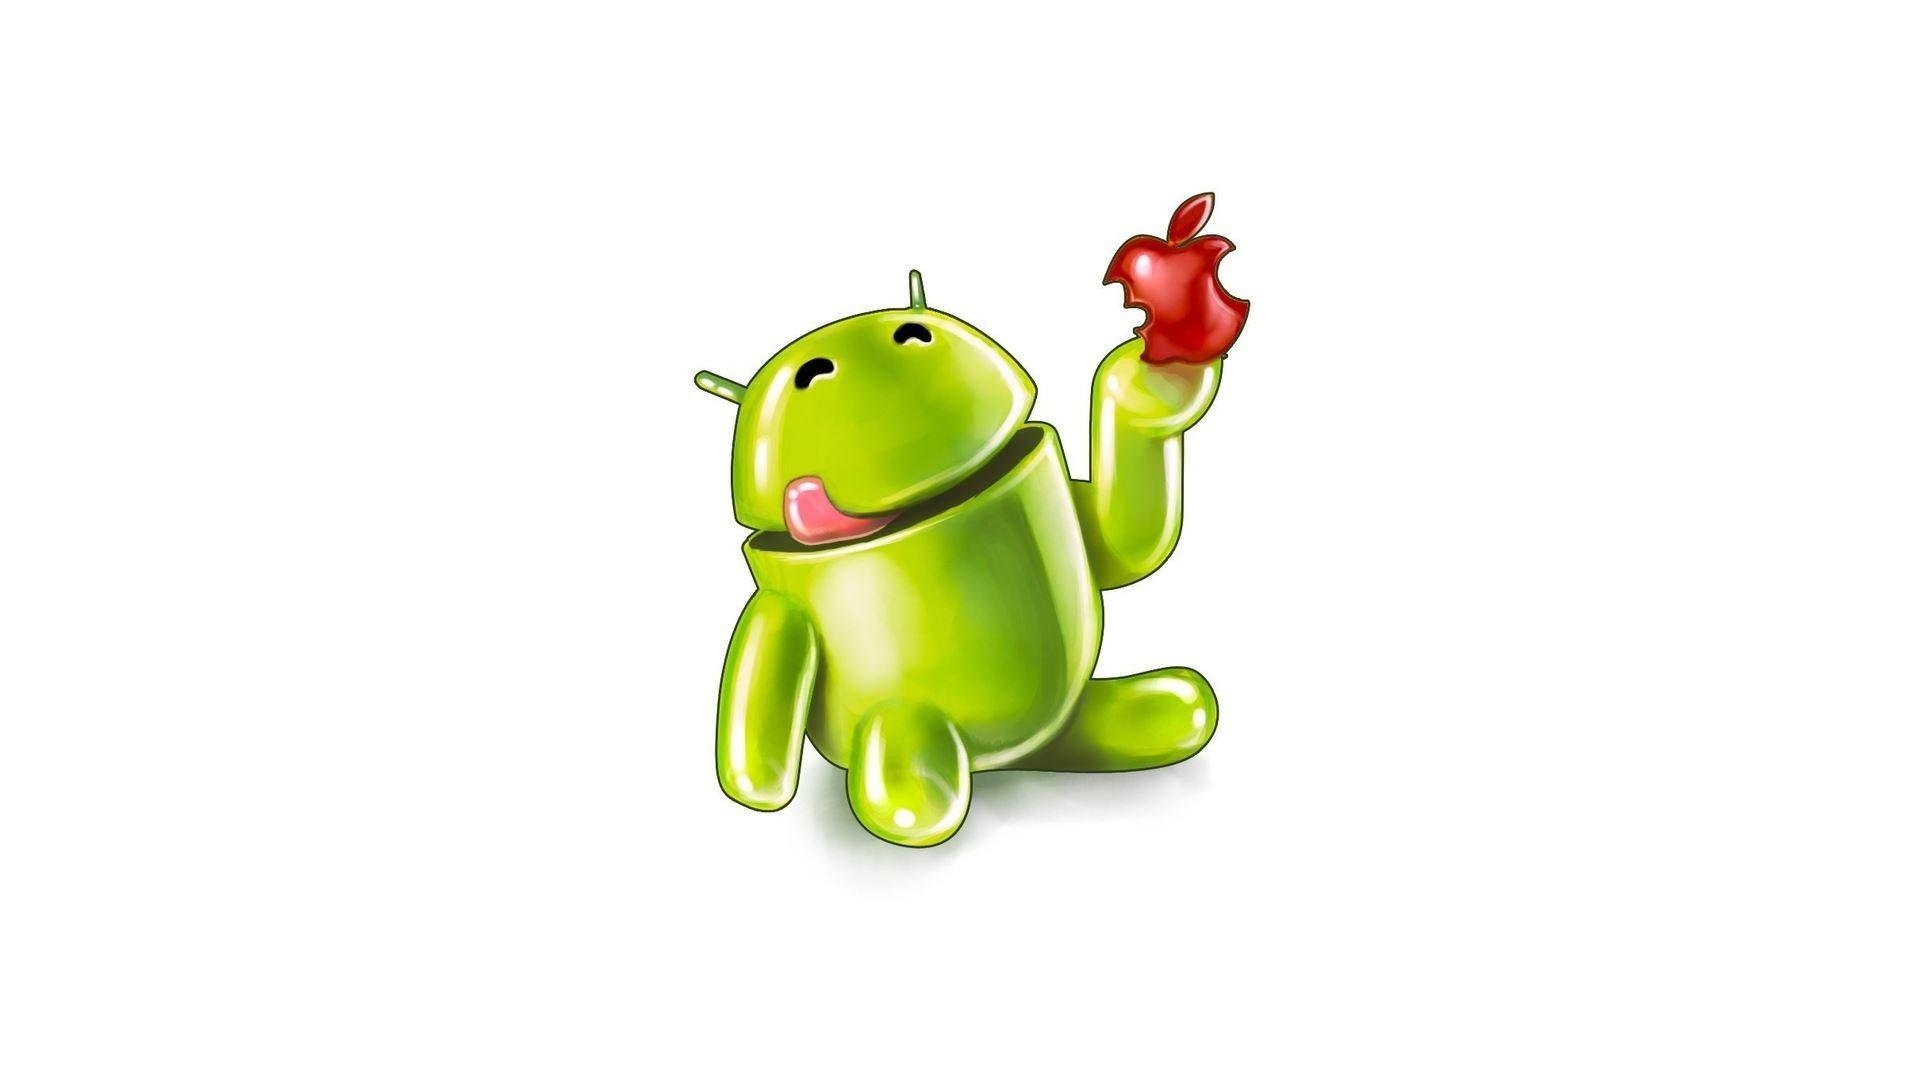 Android eat Apple | Full HD Desktop Wallpapers 1080p